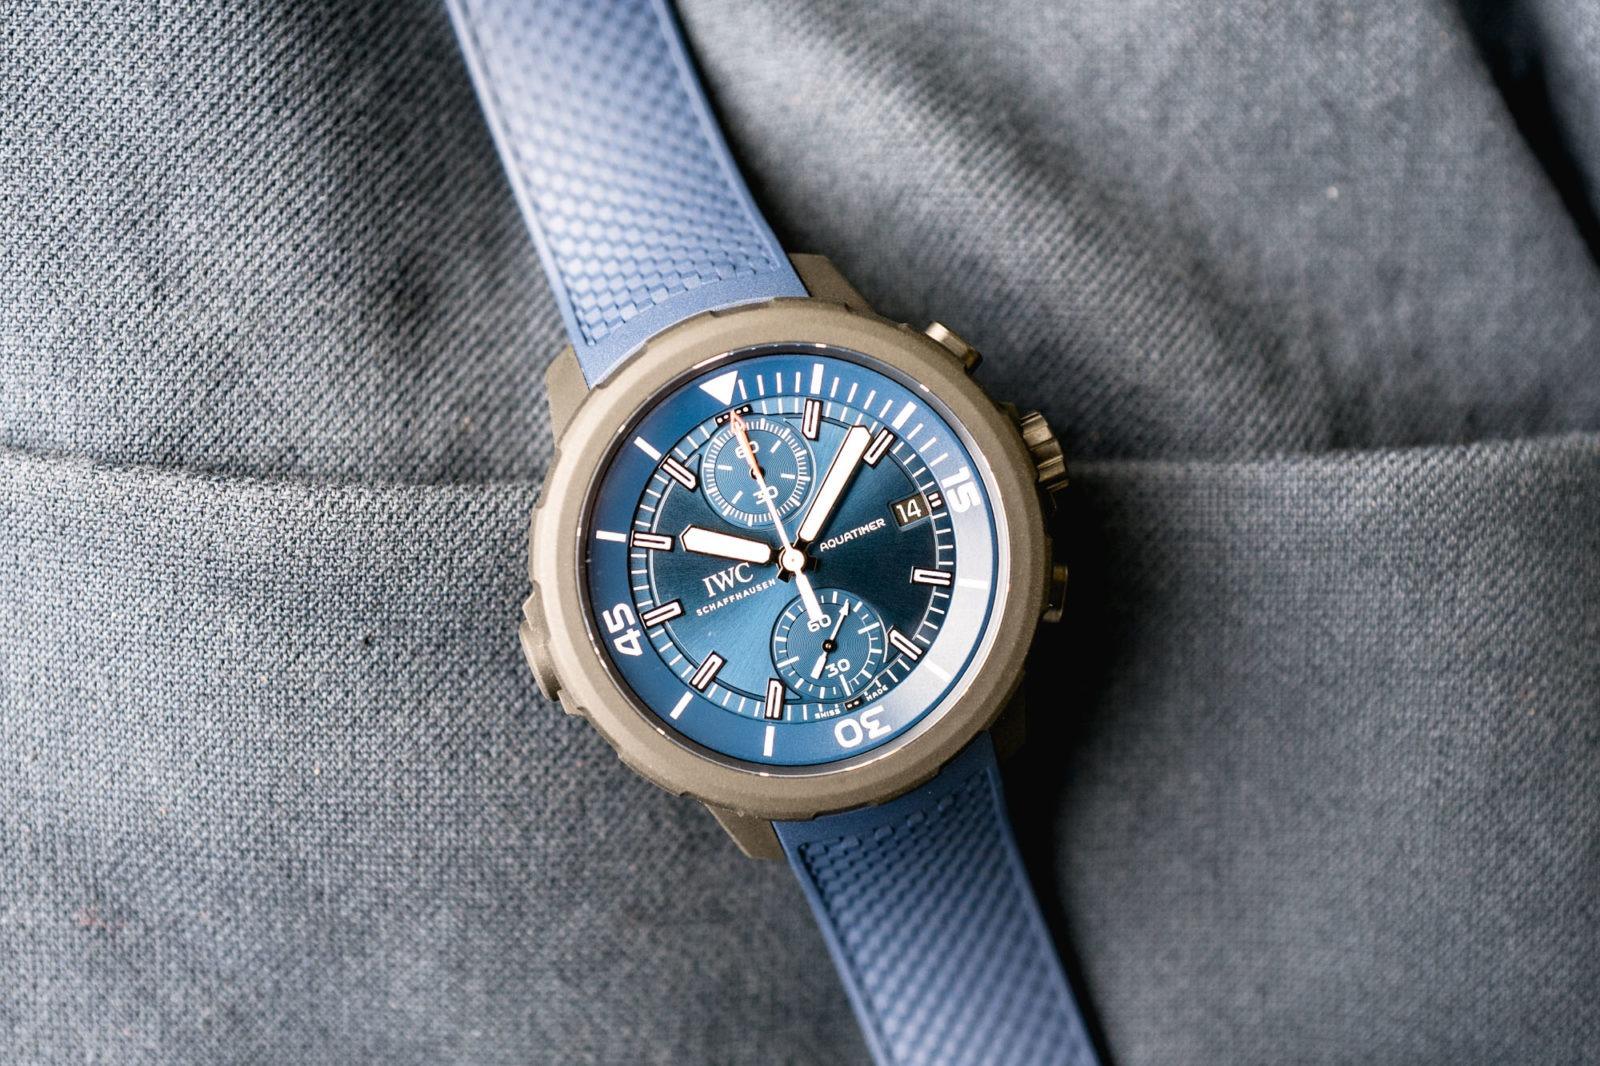 IWC Aquatimer Chronograph - Edition Laureus 2019 - Cadran